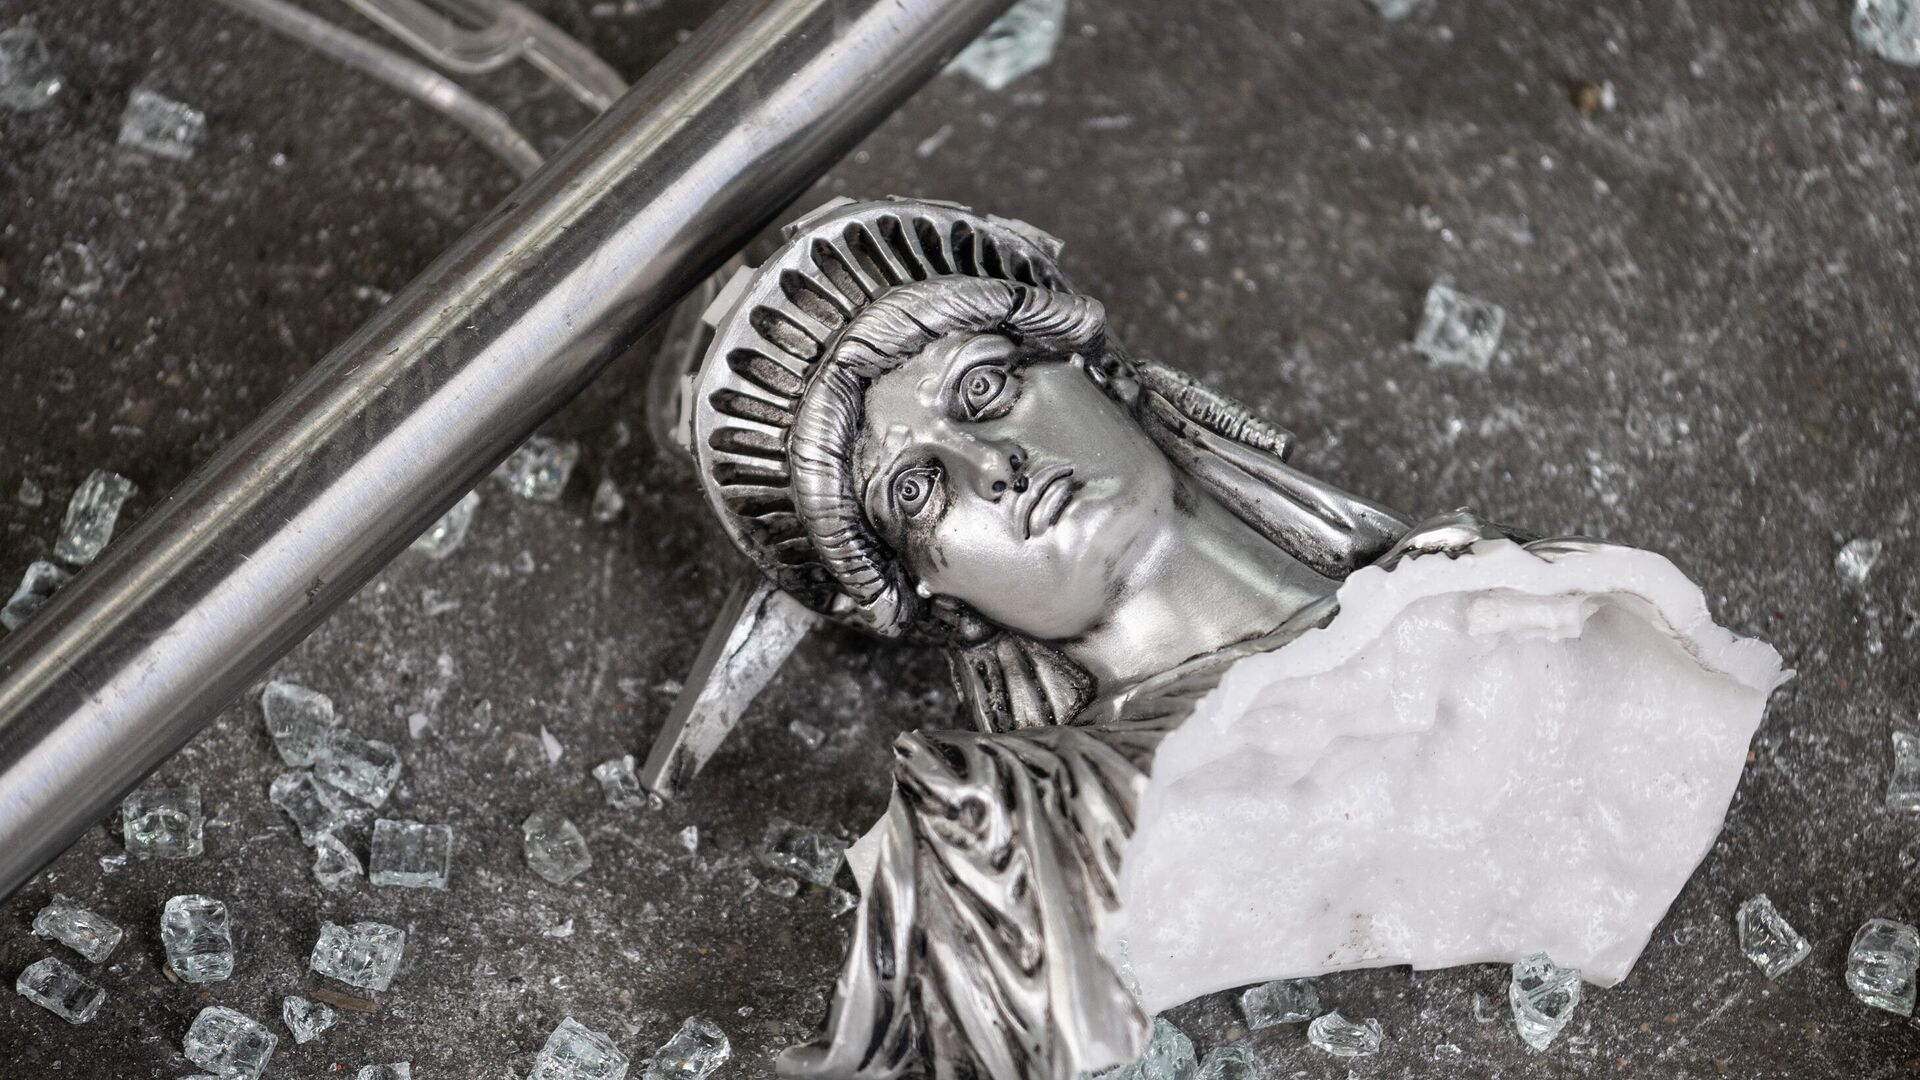 Разбитая фигура Статуи Свободы  - РИА Новости, 1920, 01.05.2021